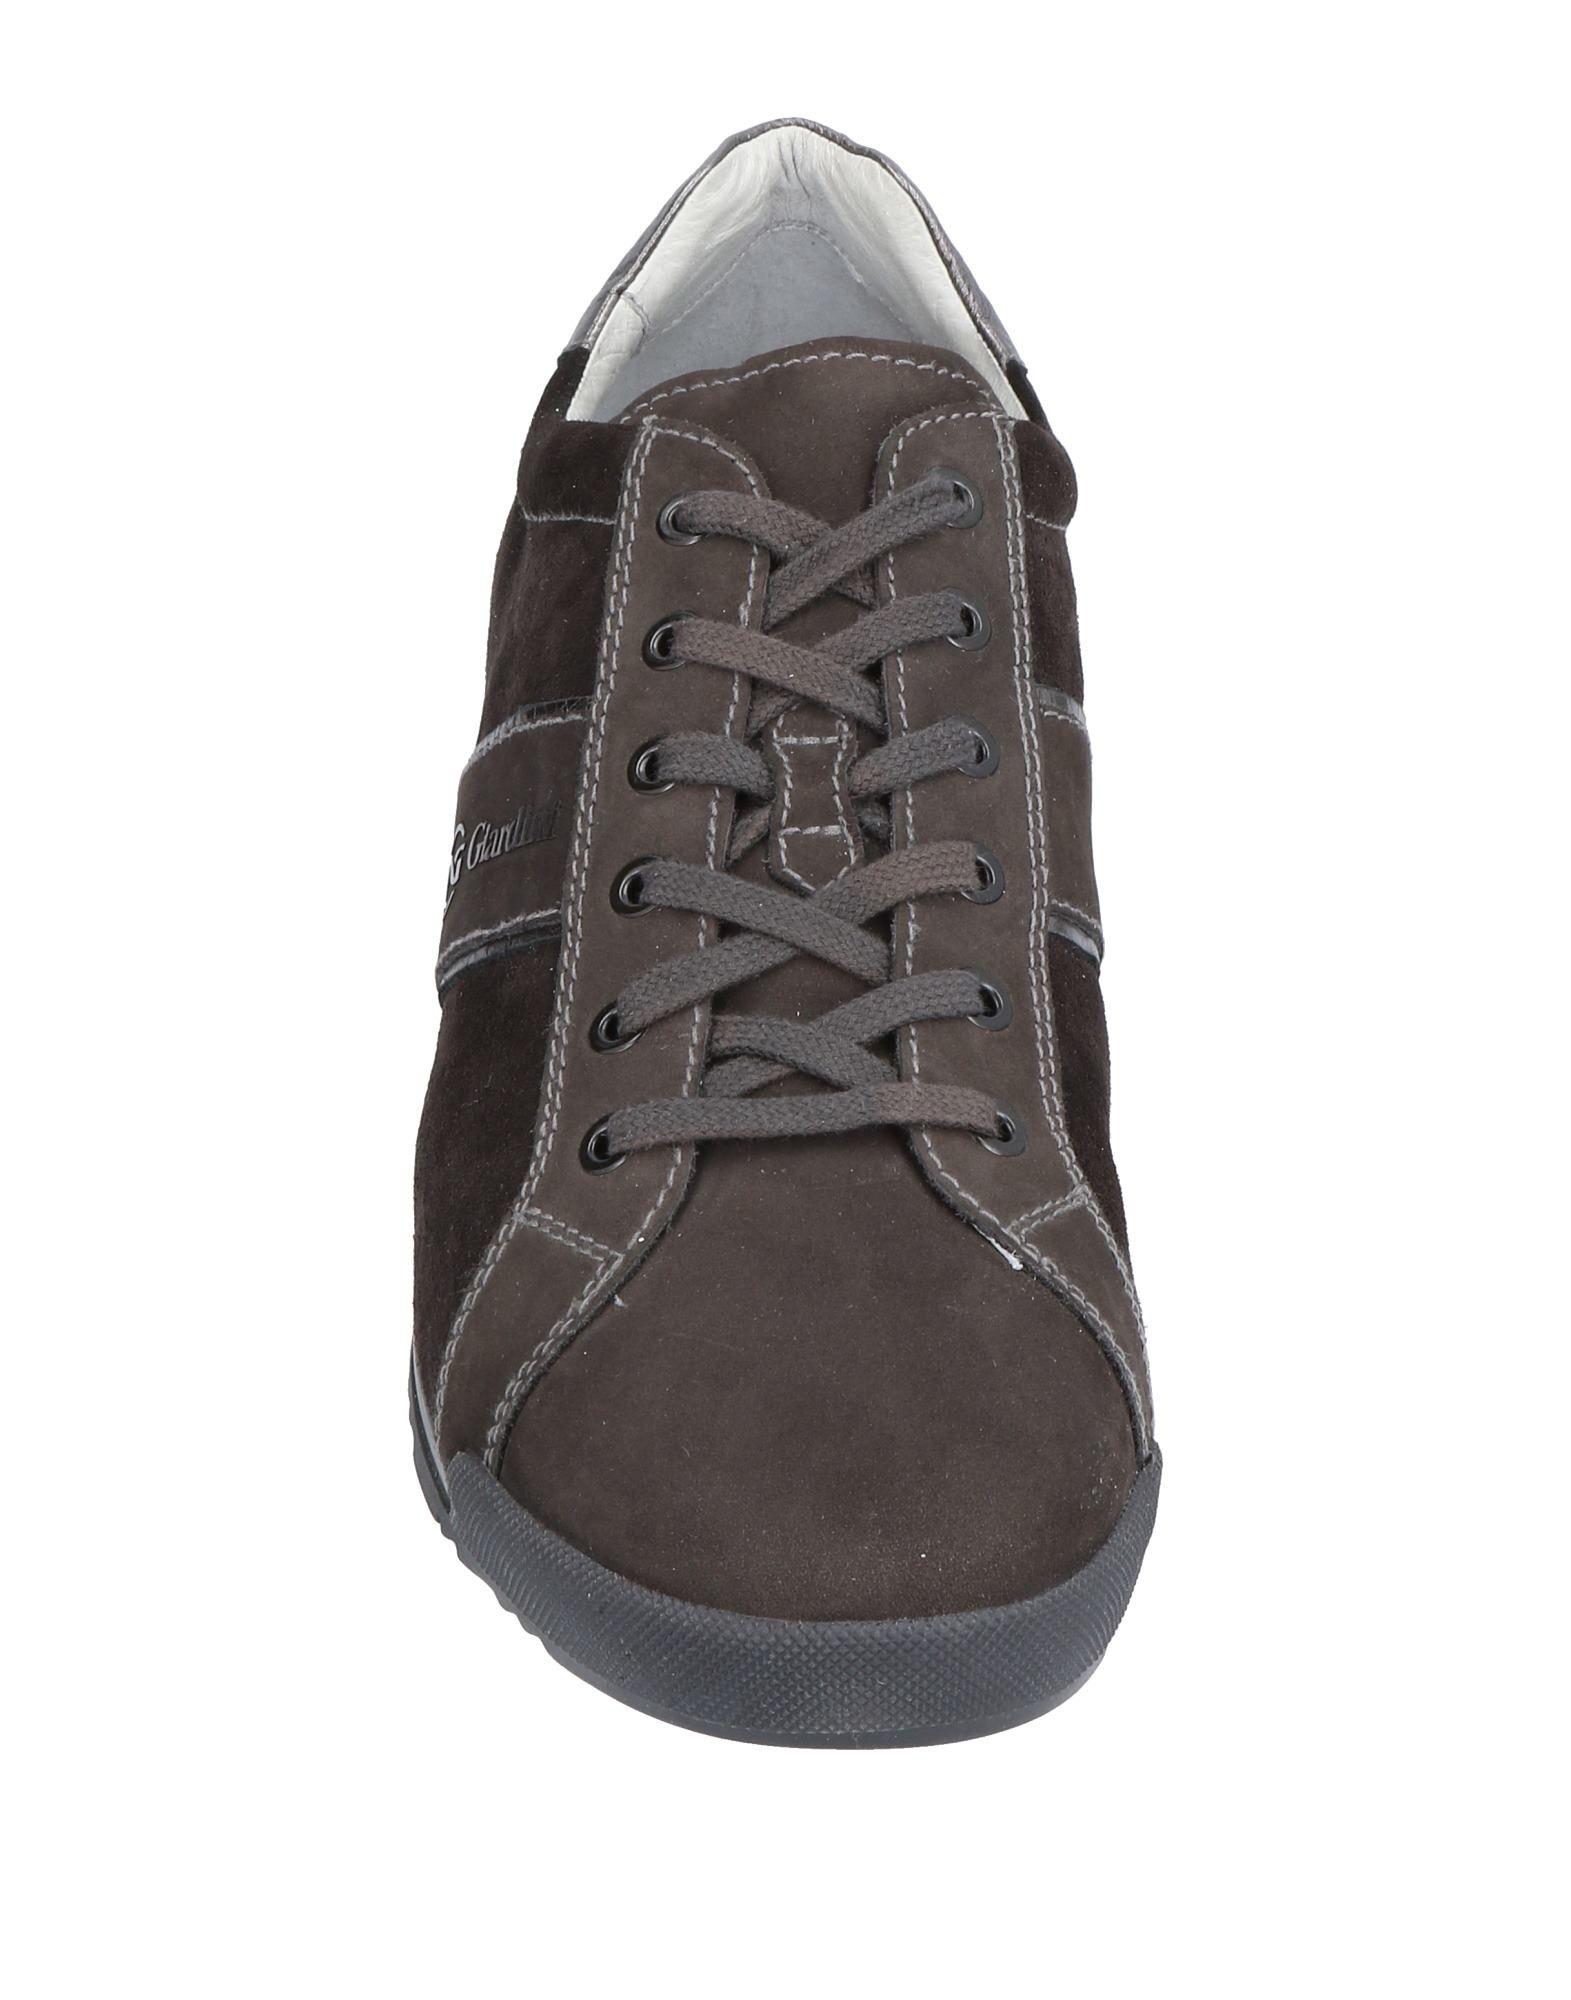 Rabatt echte Sneakers Schuhe Ng Nero Giardini Sneakers echte Herren  11499930OS a13cb0